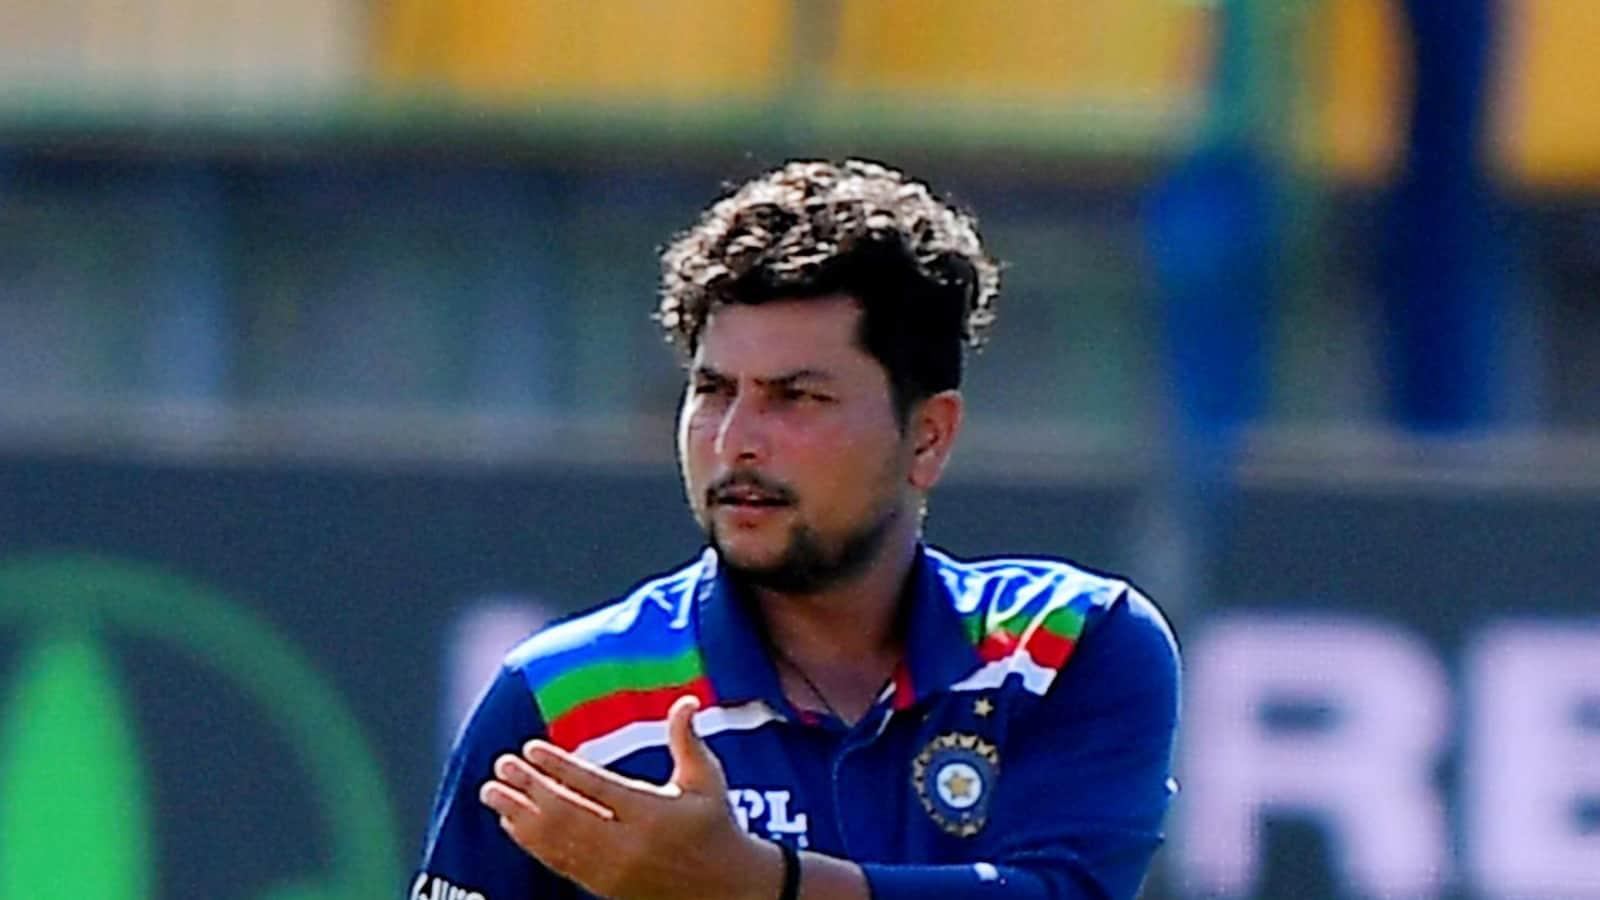 Kuldeep Yadav Back from UAE After Sustaining Knee Injury, May Miss Most of Domestic Season